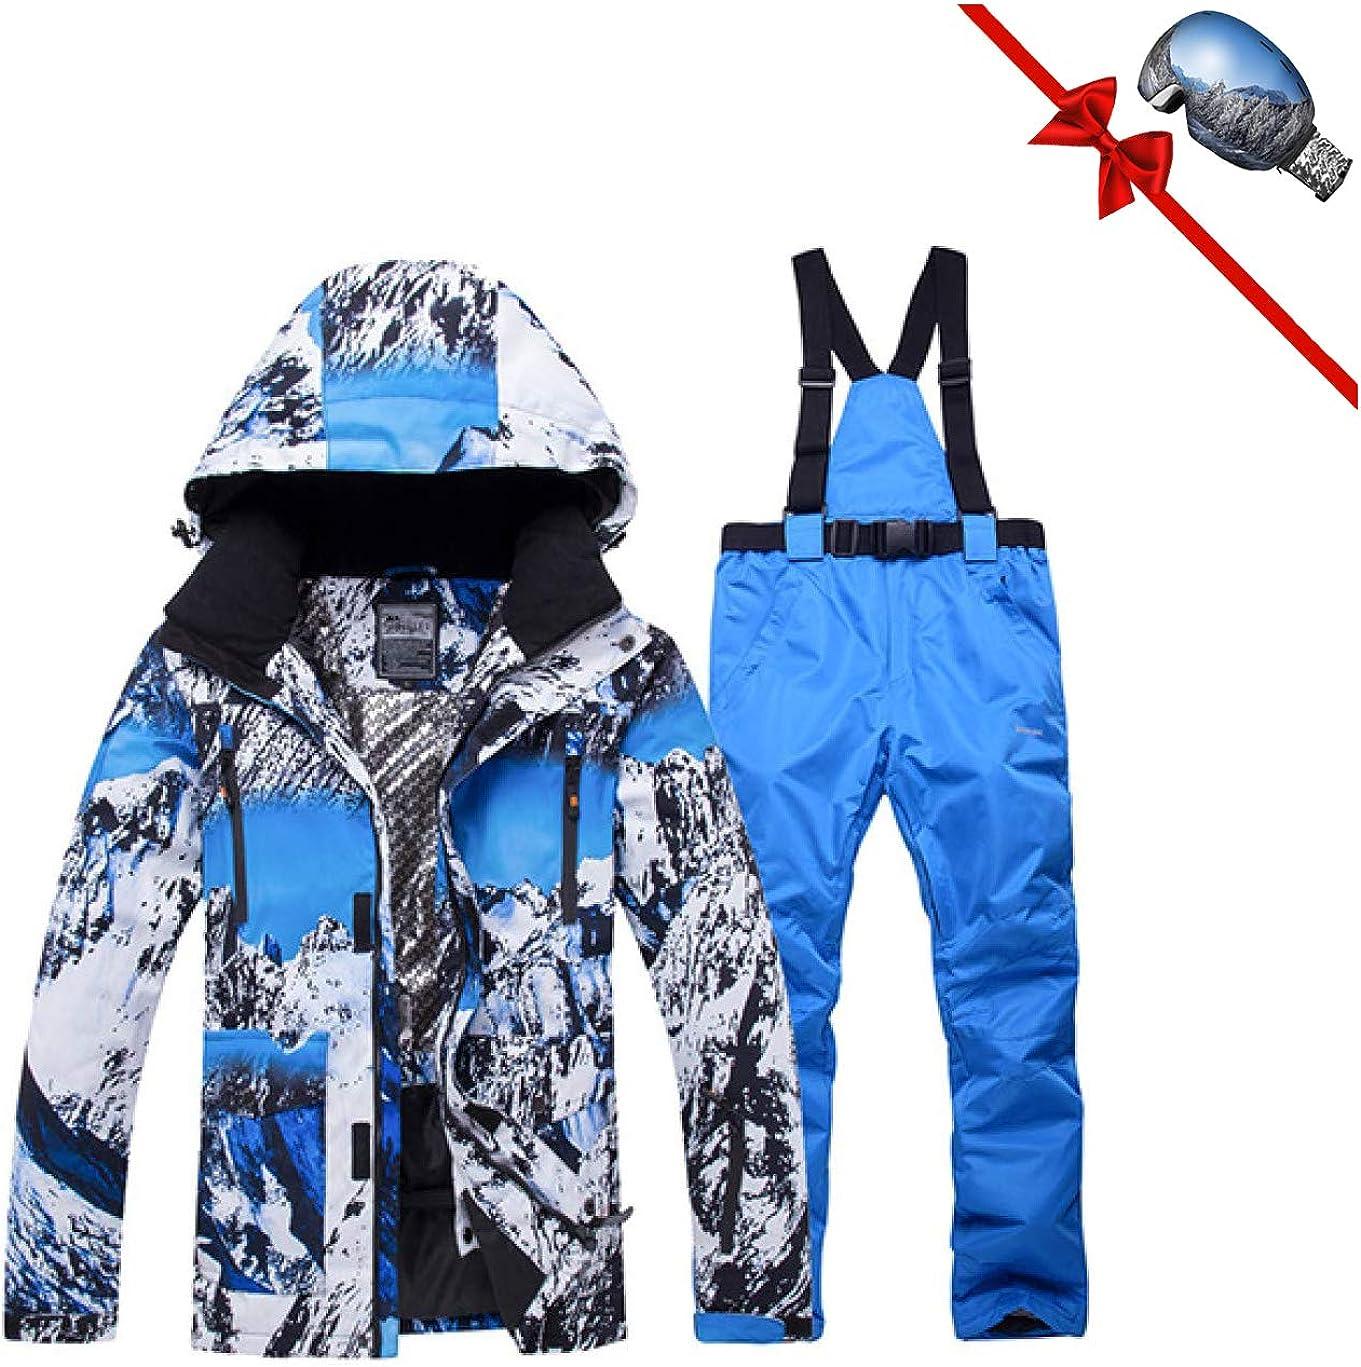 Ski Suit Men New XR Windproof Waterproof Thicken Male Clothes Coat Trousers Pants Winter Ski Snowboard Jacket